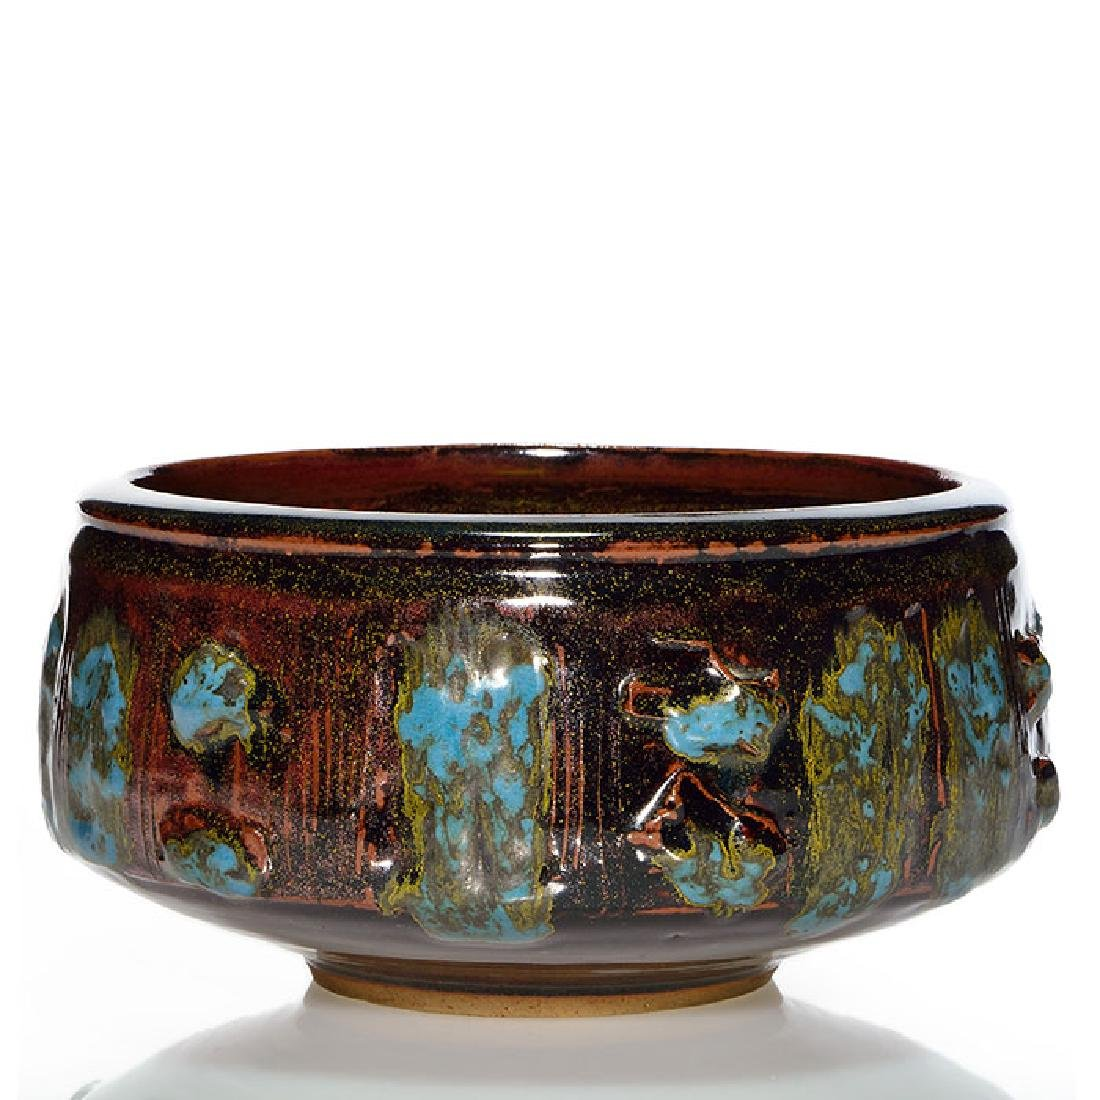 "Vivika & Otto Heino bowl, 4 1/4"" x 8 1/2"""